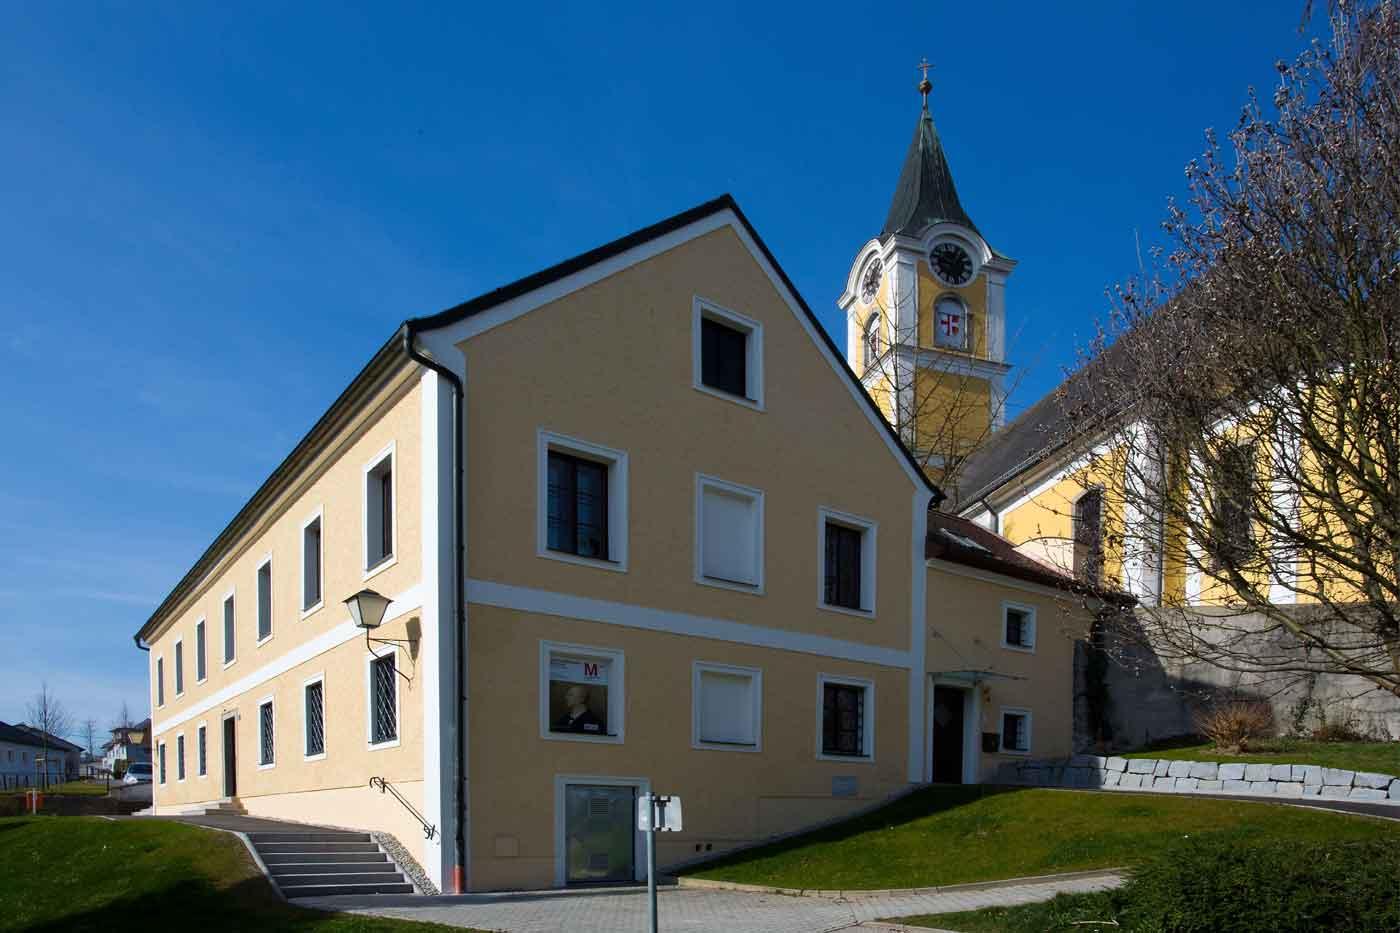 Das Geburtshaus Anton Bruckners in Ansfelden © Ing. Otmar Hamberger